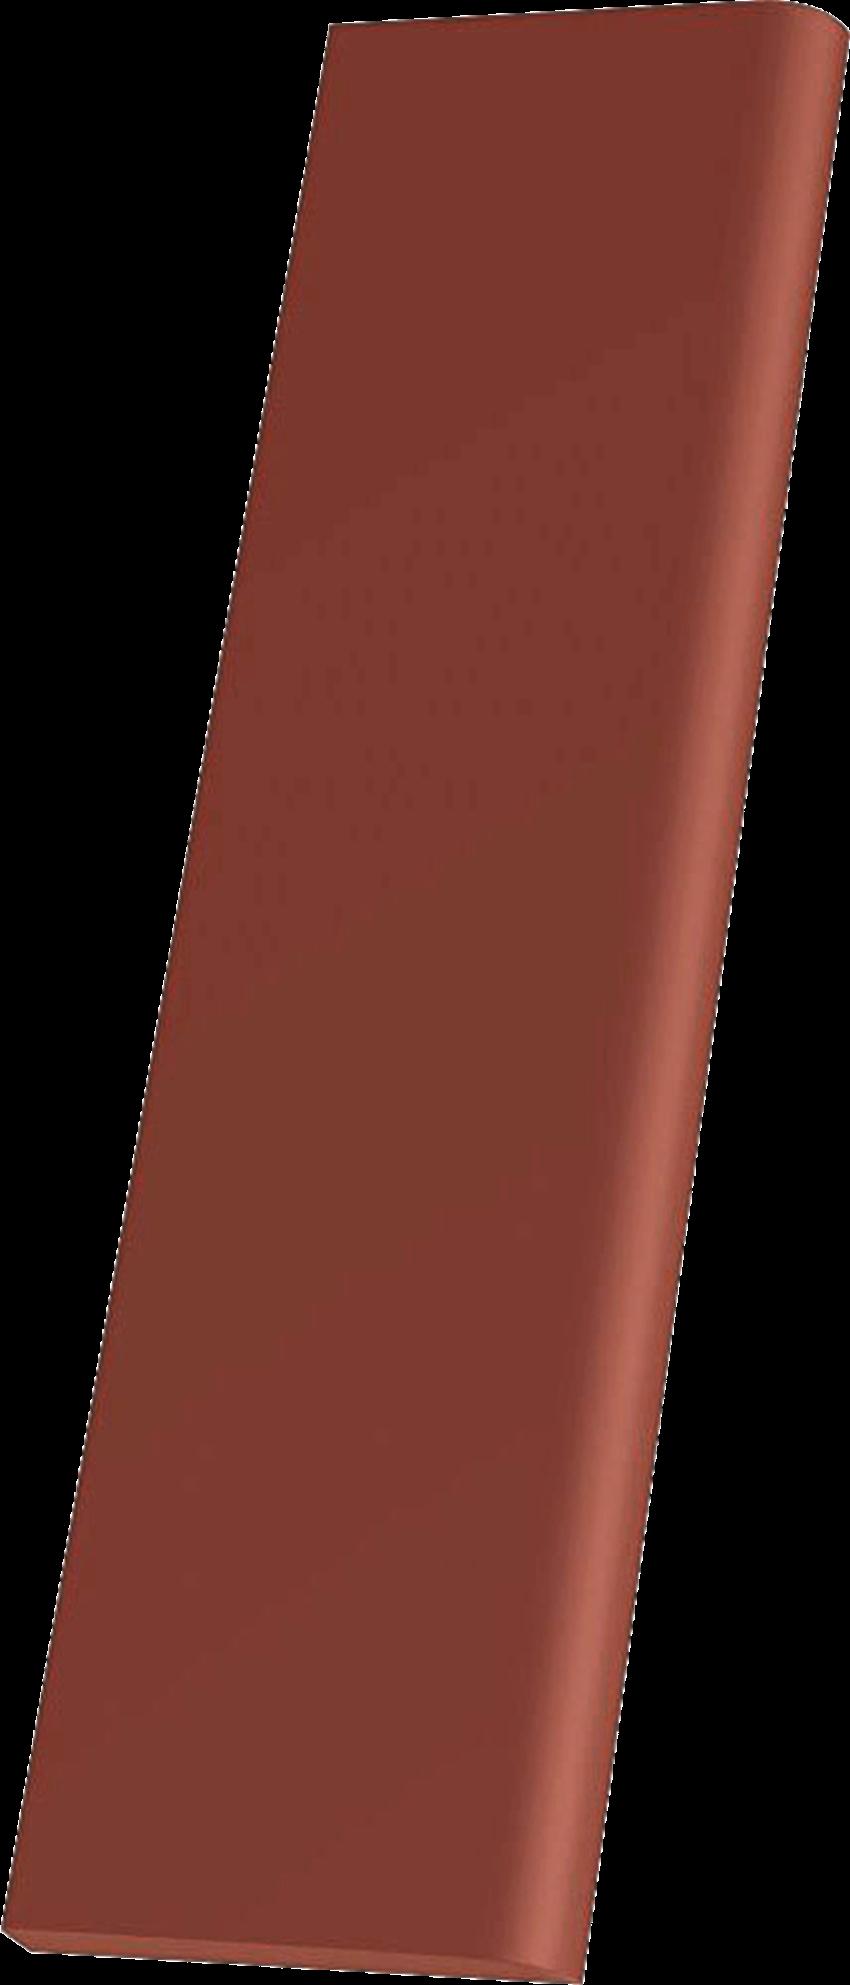 Płytka cokołowa 8,1x30 cm  Paradyż Natural Rosa Cokół 8,1X30 G1